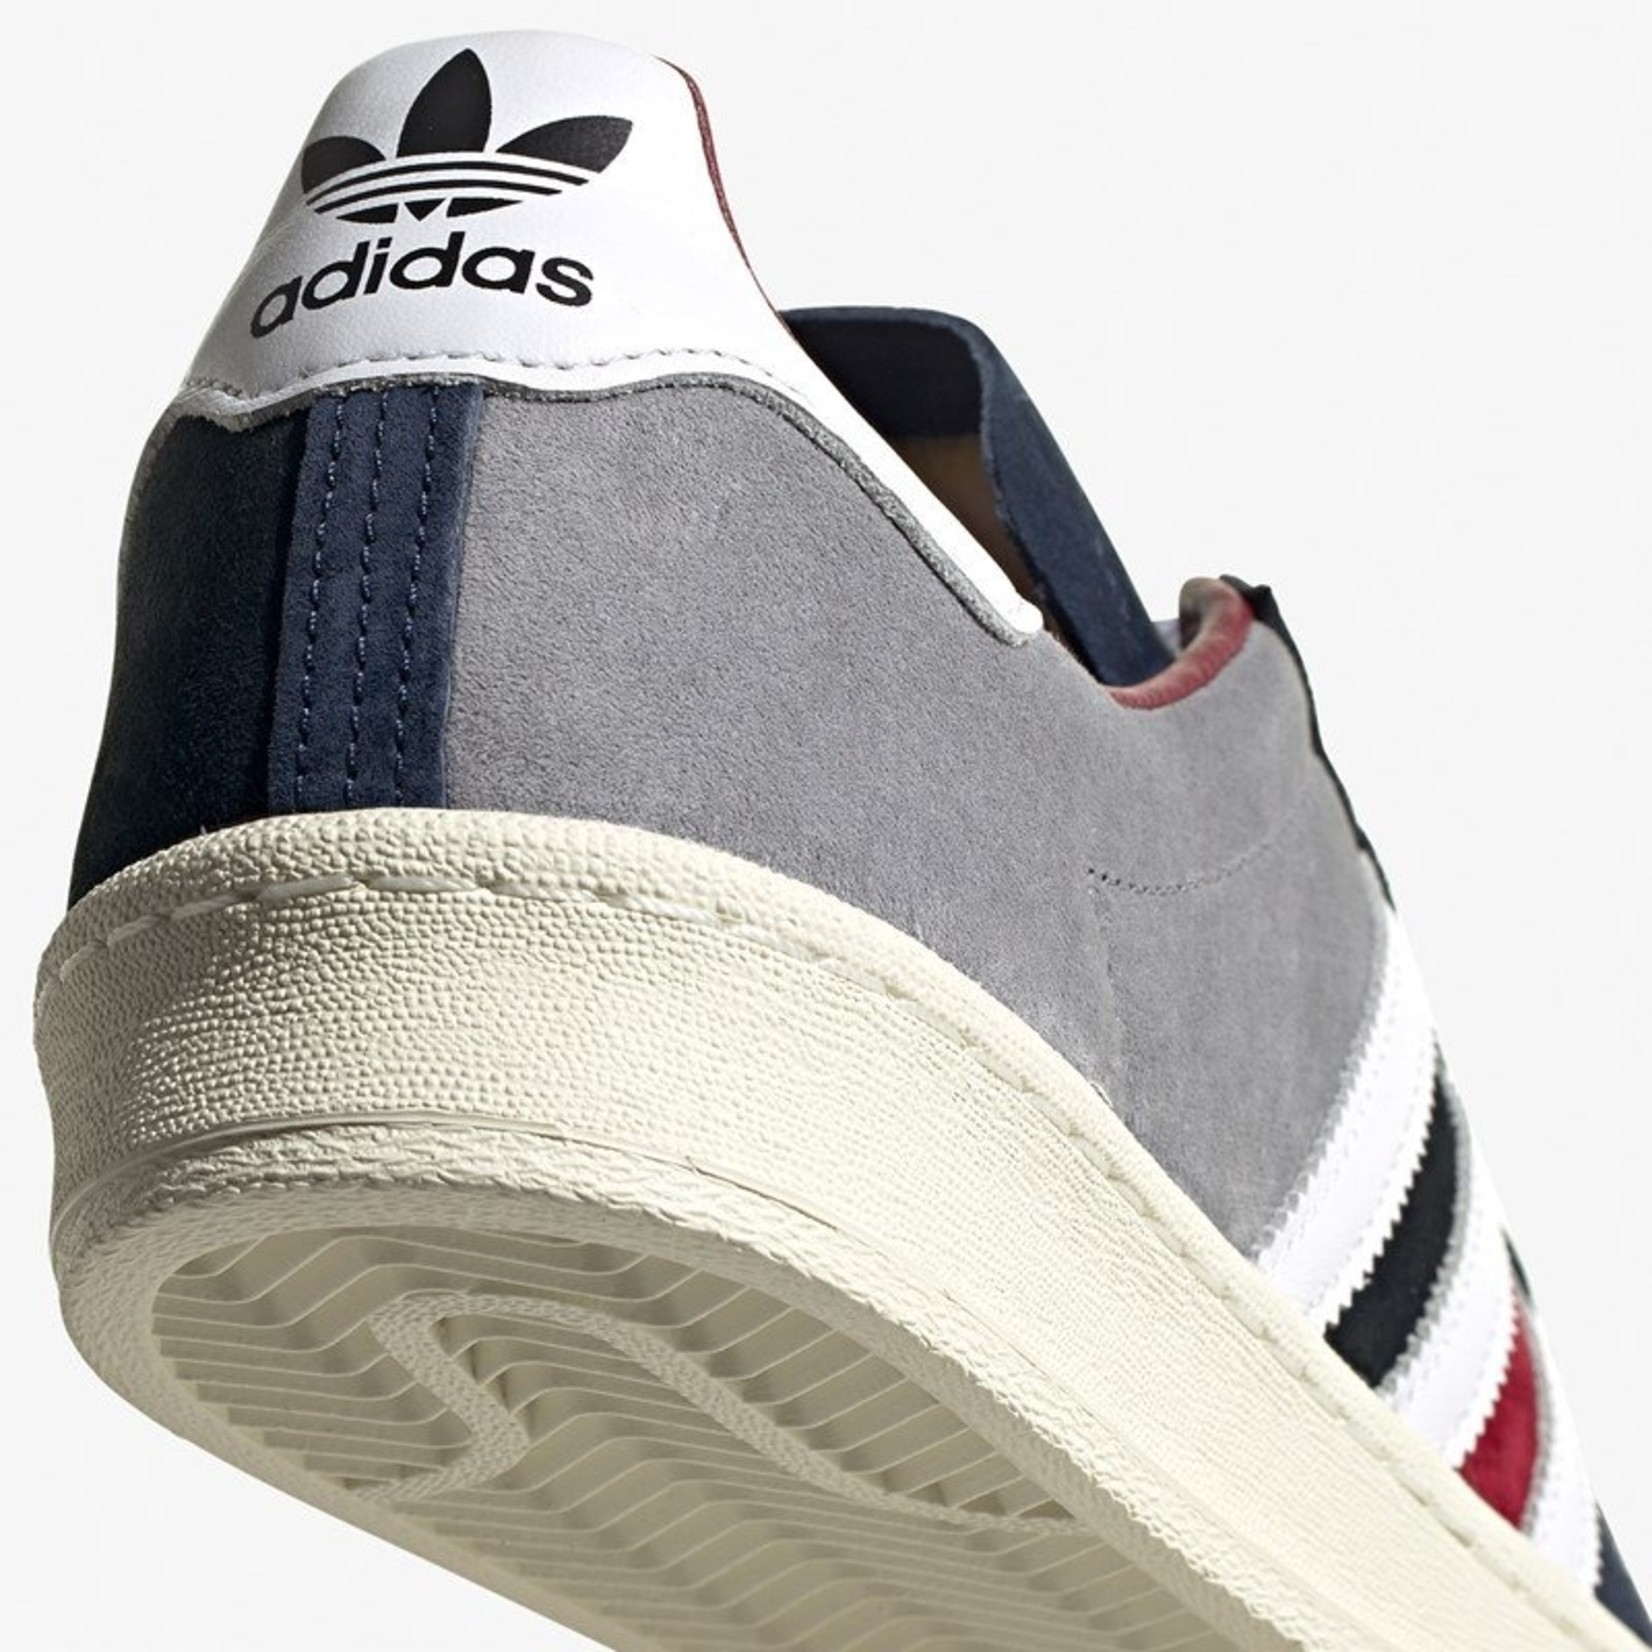 Adidas Campus 80s Borcol/Ftwbla